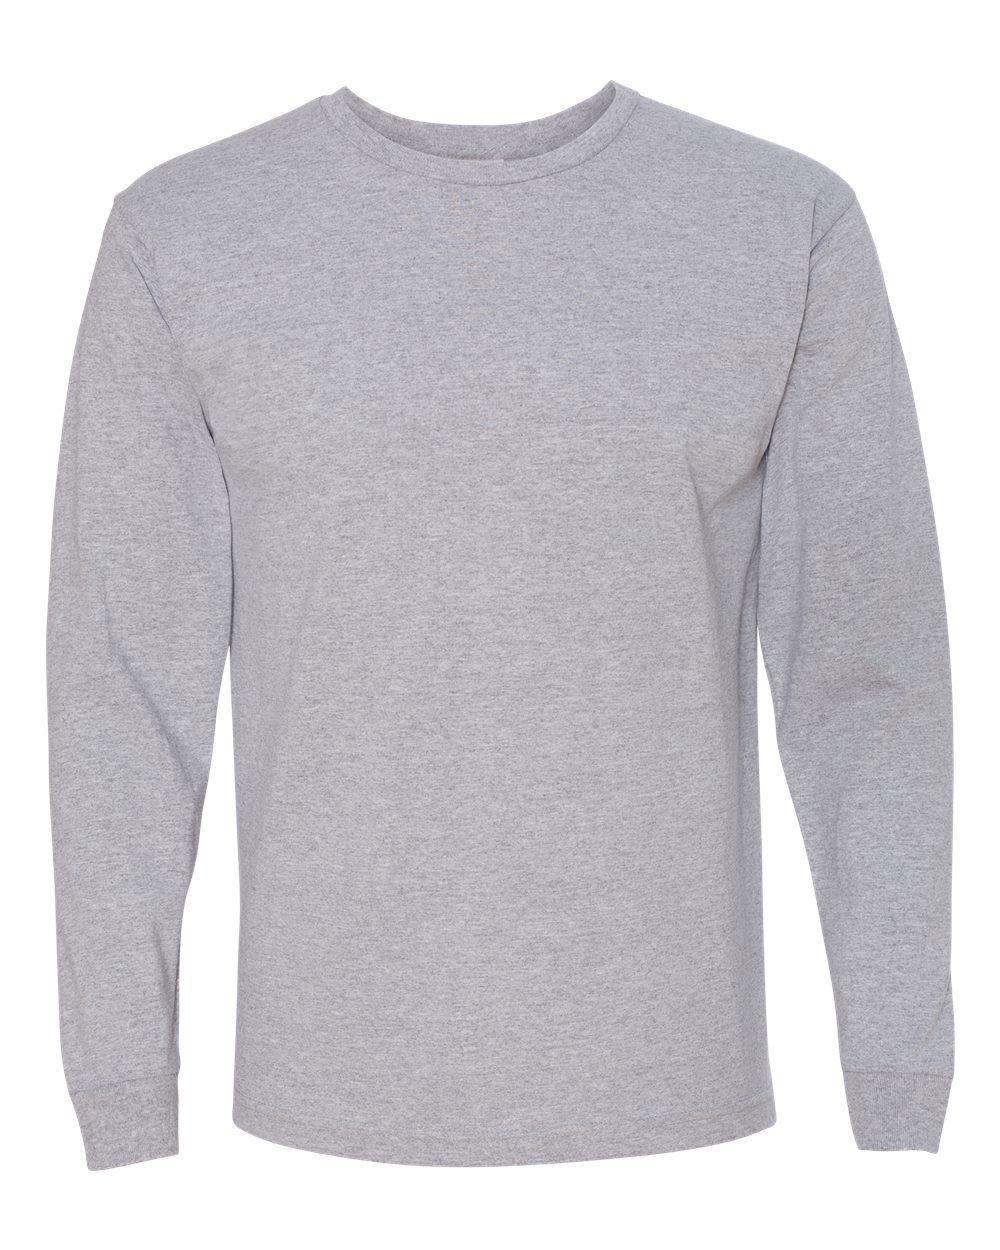 Bayside Usa Made 100 Cotton Long Sleeve T Shirt 5060 Dark Ash X Large In 2021 T Shirt Png Long Sleeve Tshirt Fashion